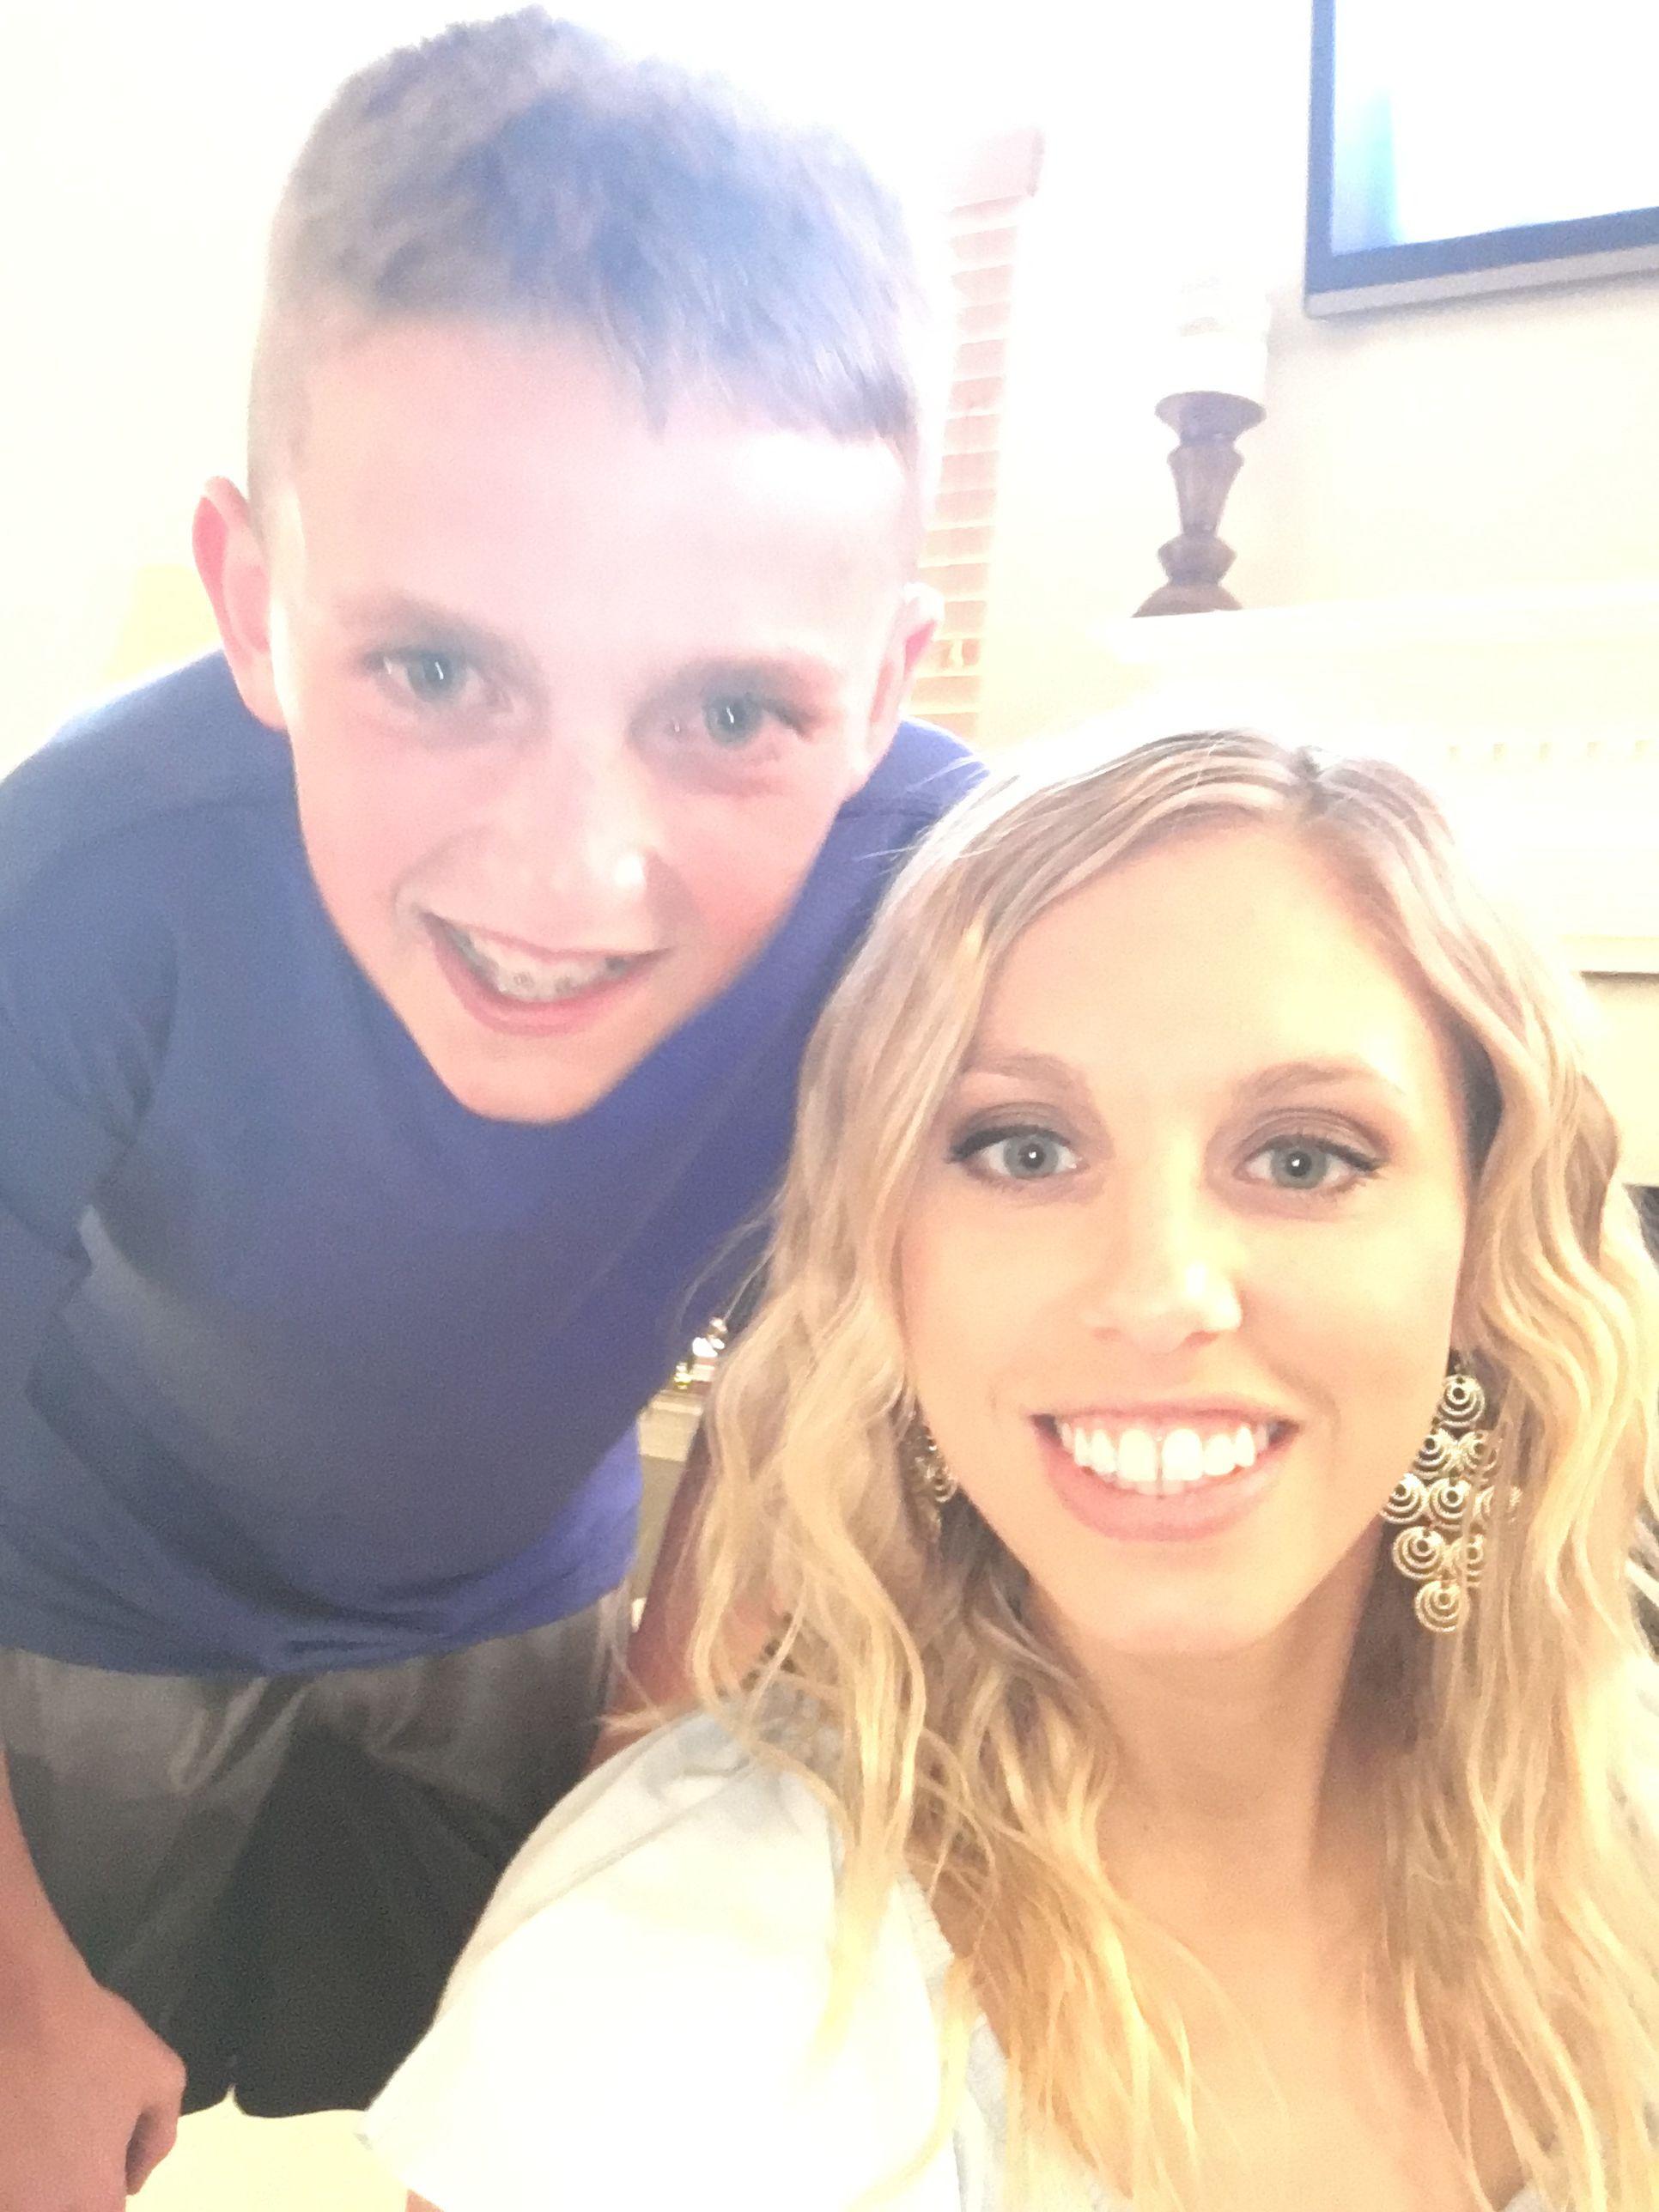 Jake and Megan spring break 2017